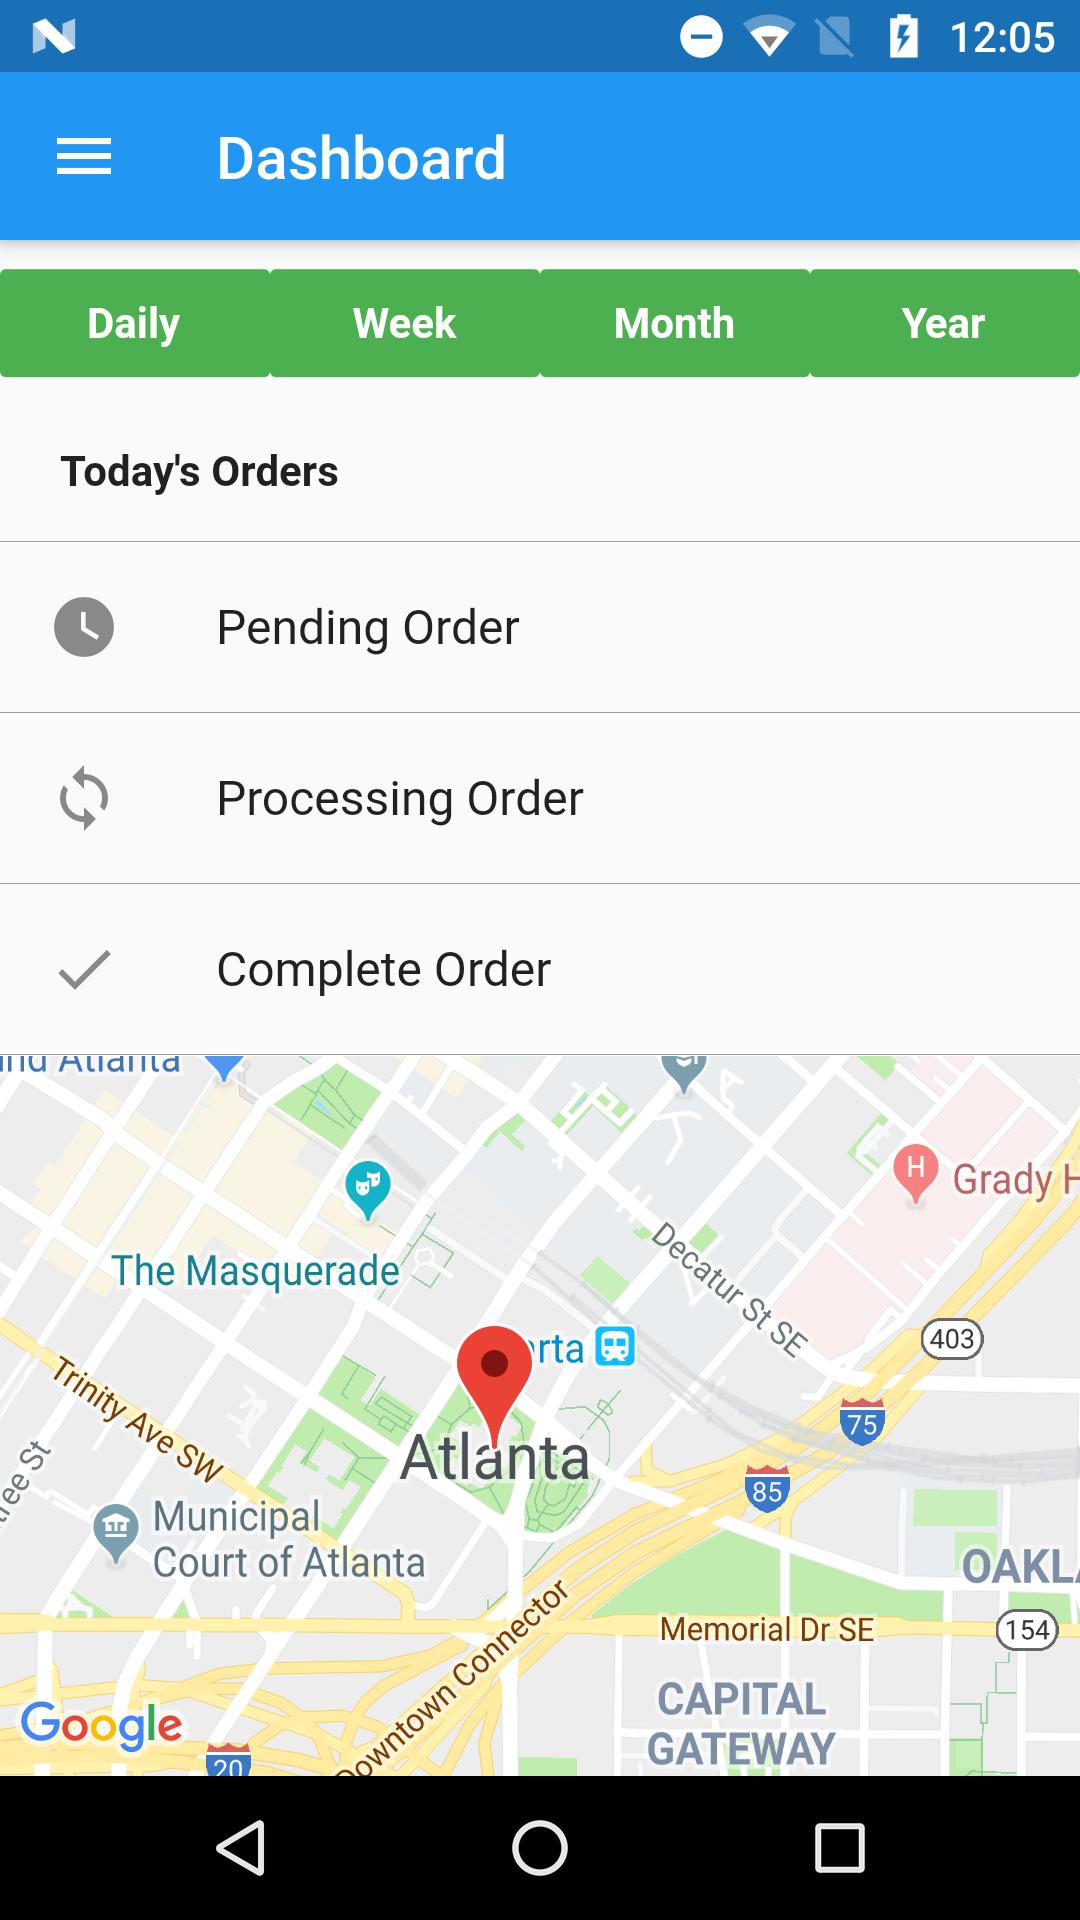 Opencart Delivery Service Mobile app - Webkul Blog